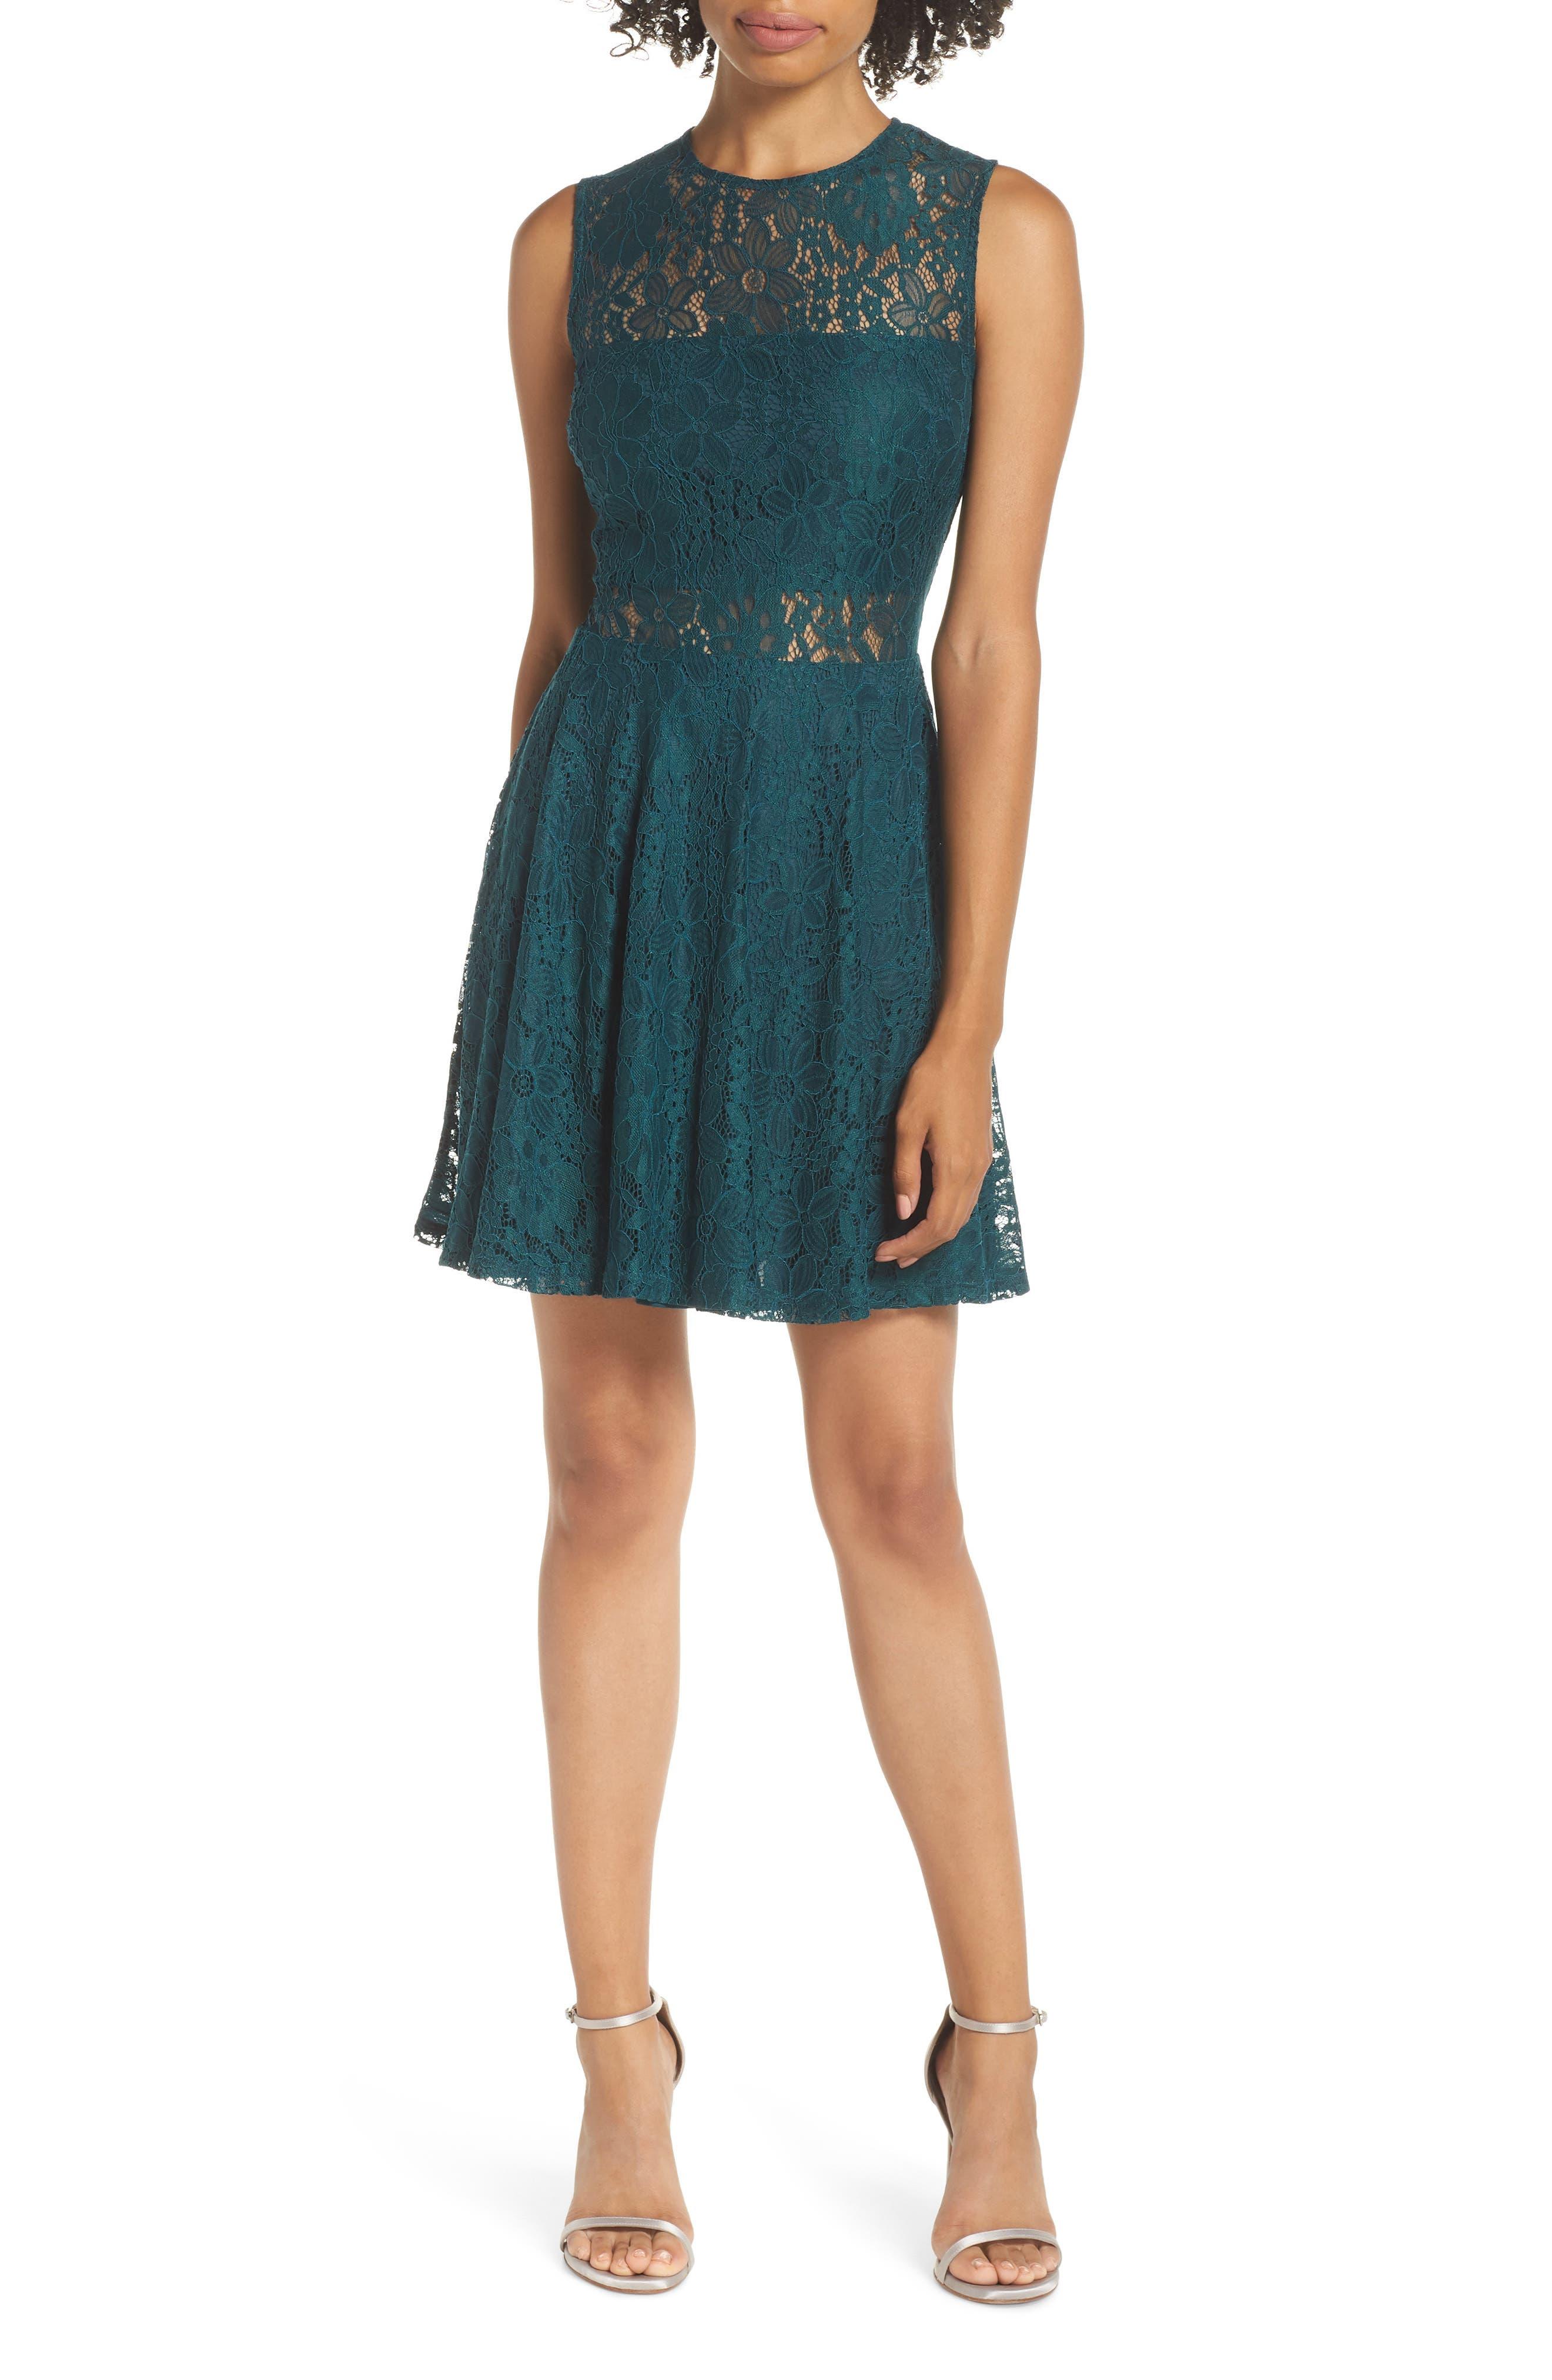 Lulus Lace Skater Dress, Green